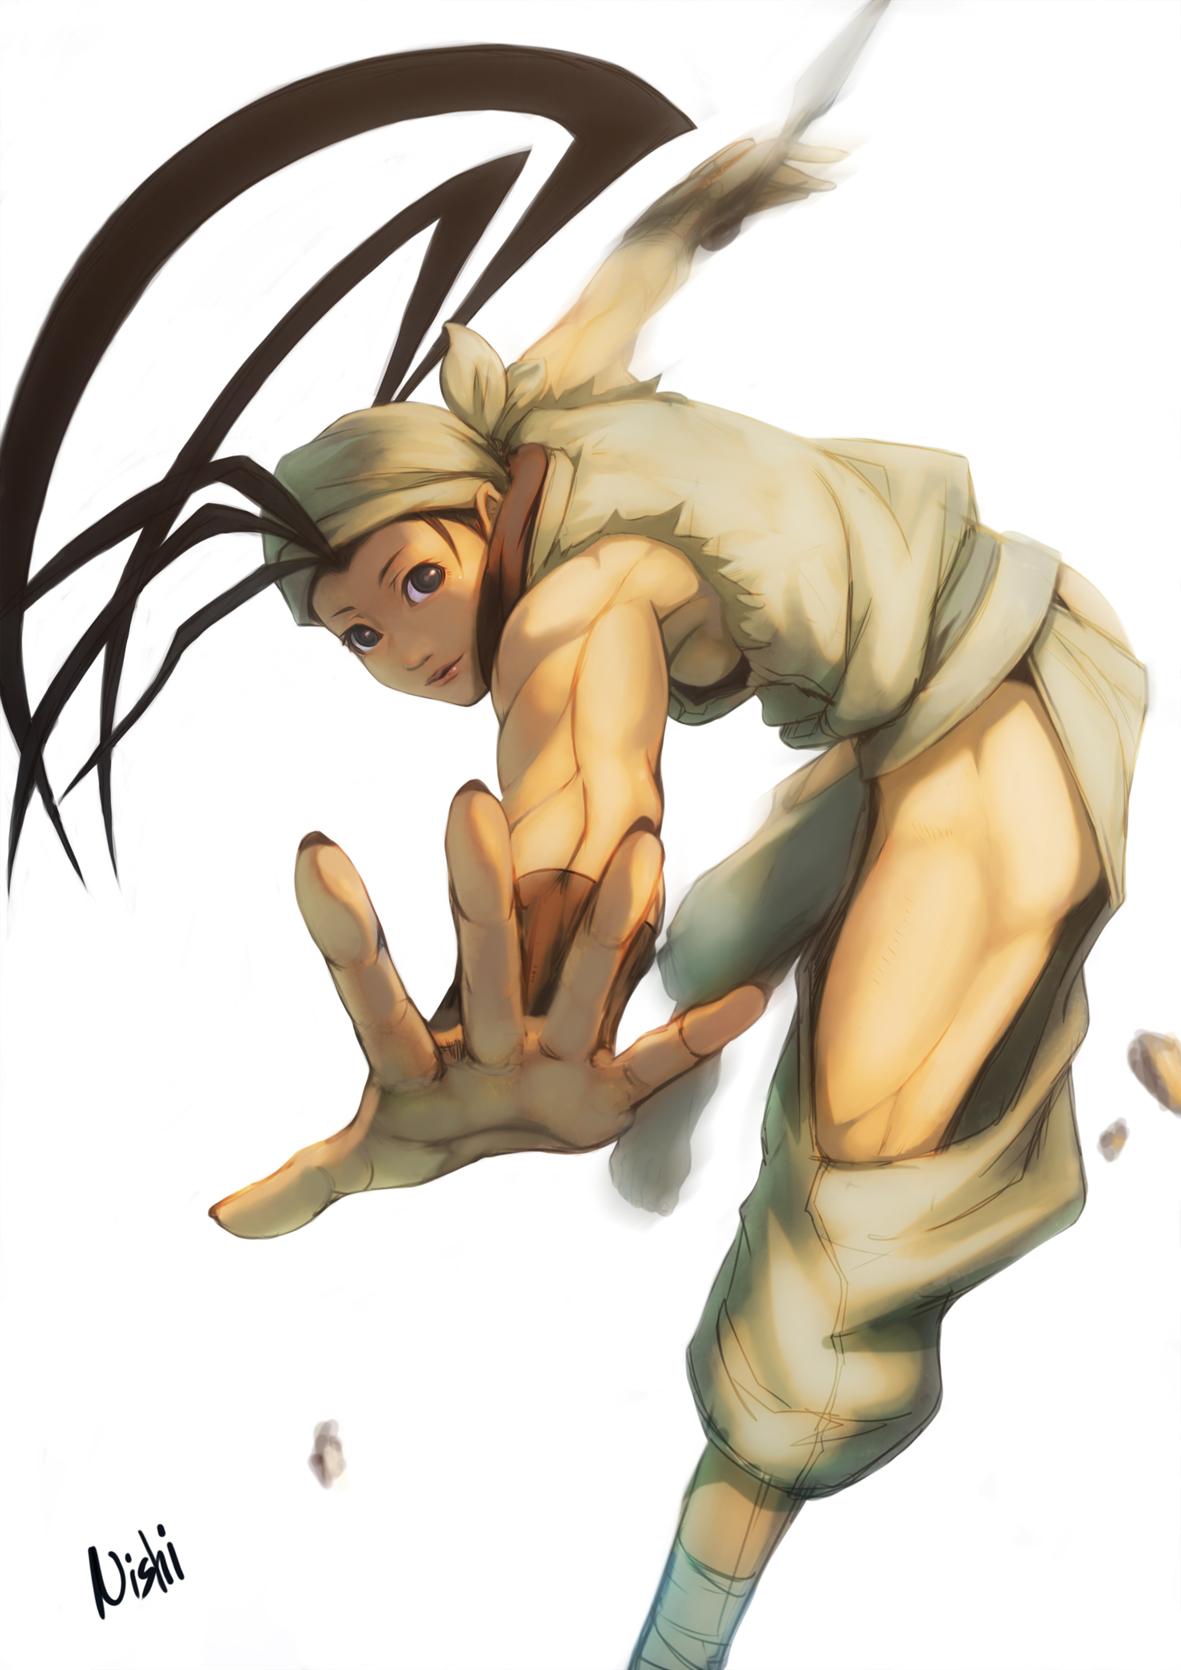 ibuki street fighter image 1229368 zerochan anime image board